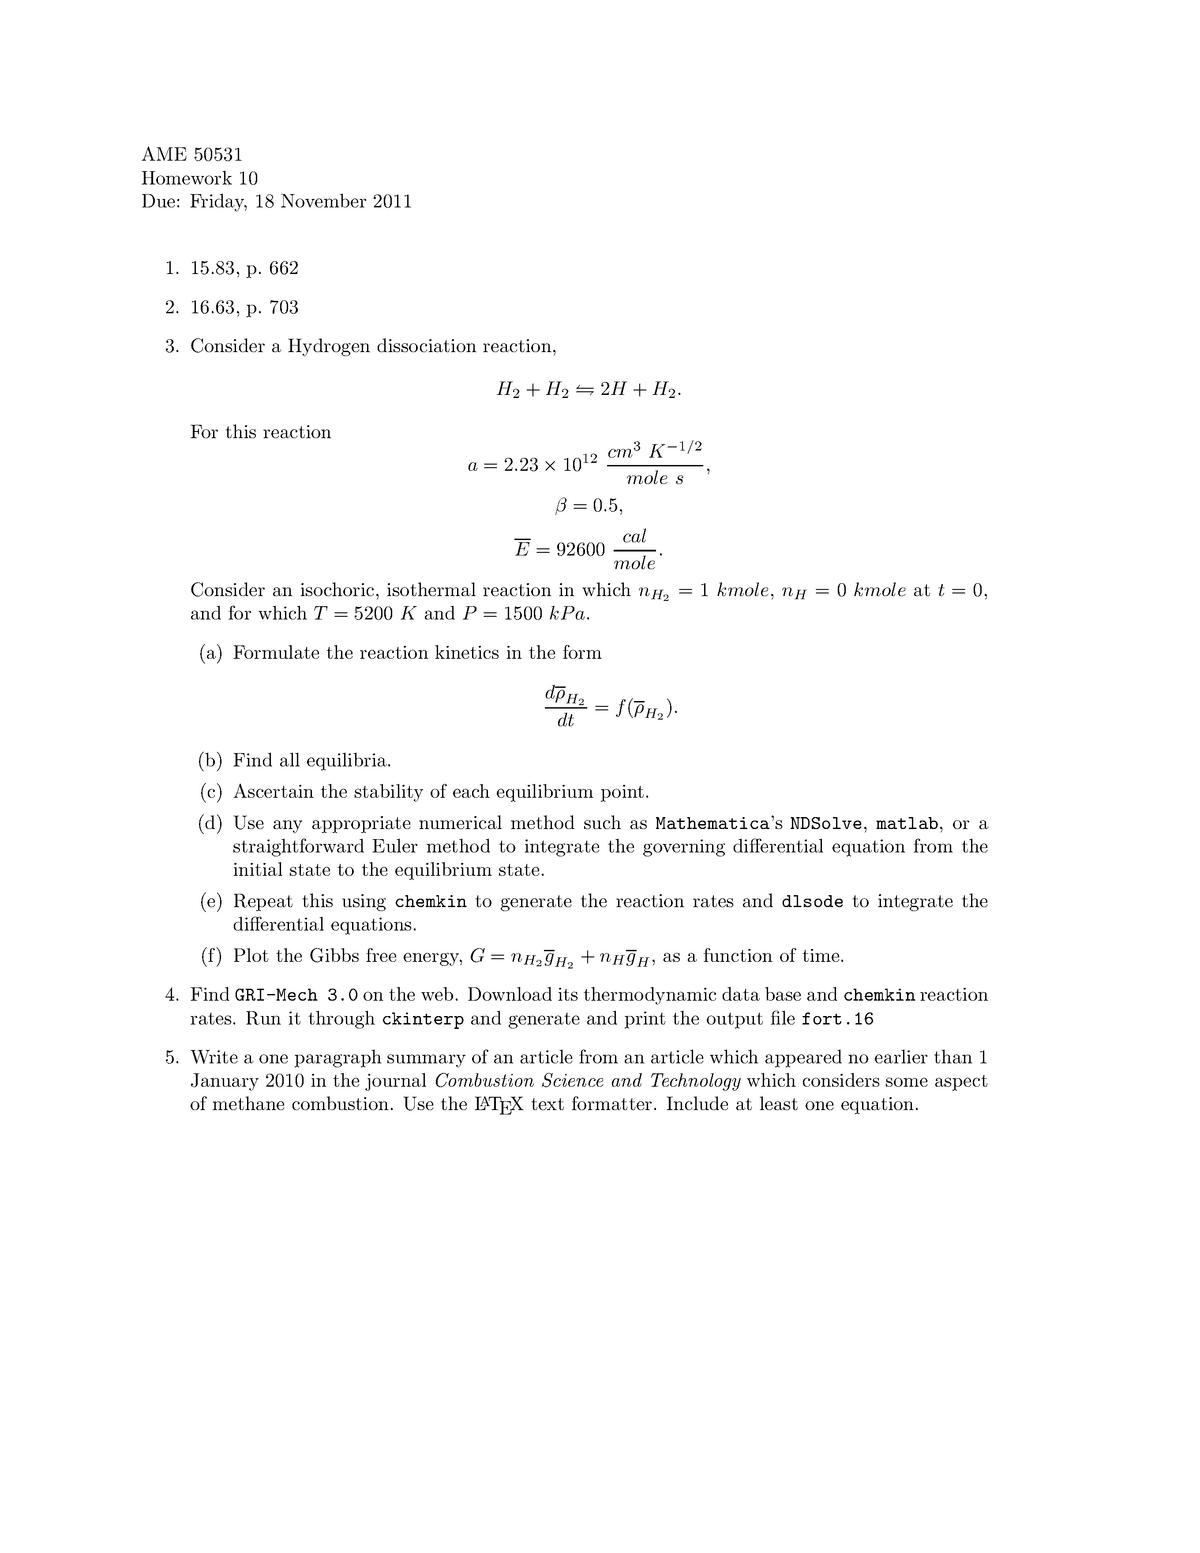 Hw 10 - questions - AME 50531: Intermediate Thermodynamics - StuDocu